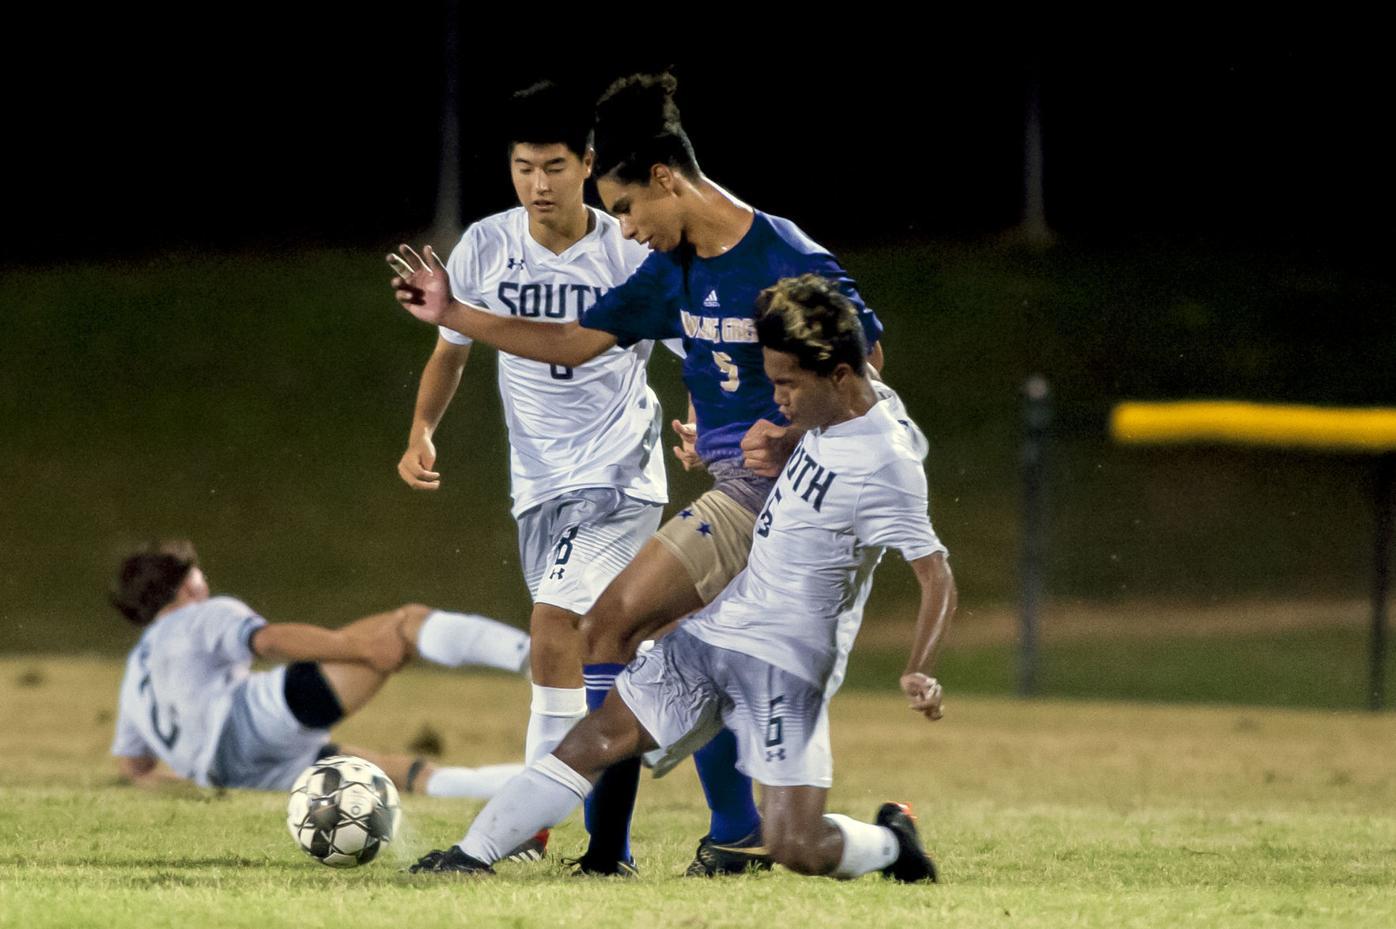 Prep boys soccer: South Warren 4-2 over Bowling Green